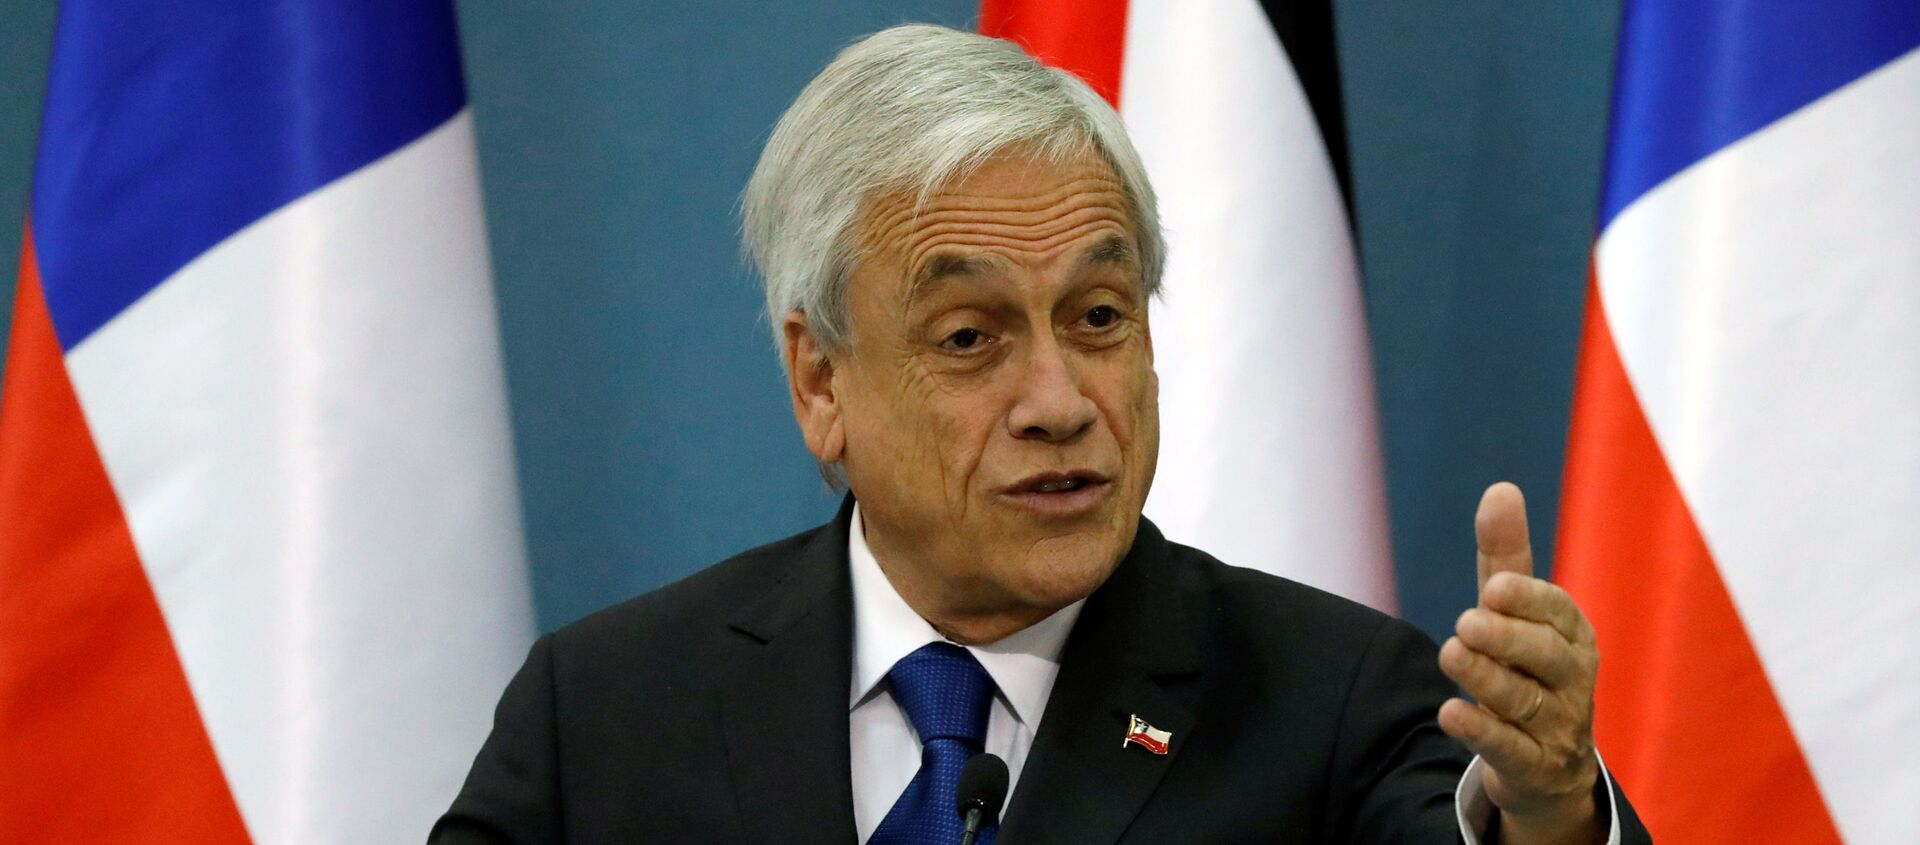 Sebastián Piñera, presidente de Chile - Sputnik Mundo, 1920, 11.07.2019